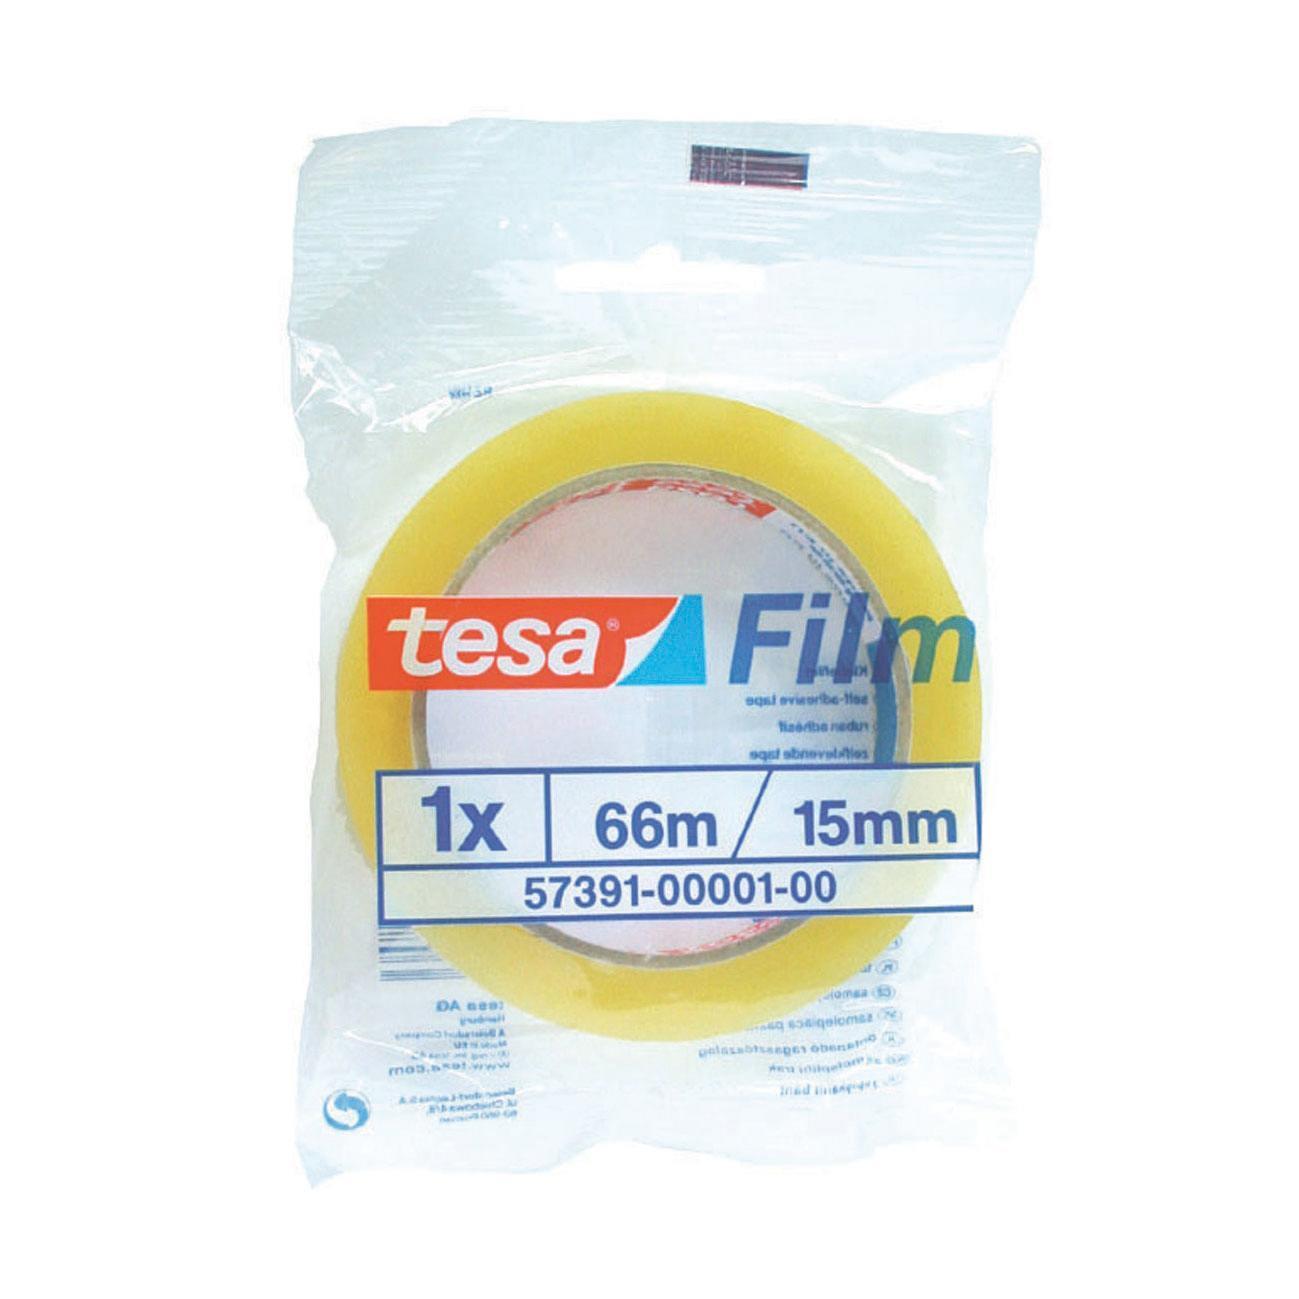 Nastro adesivo TESA tesafilm 15 mm x 66 m trasparente - 3